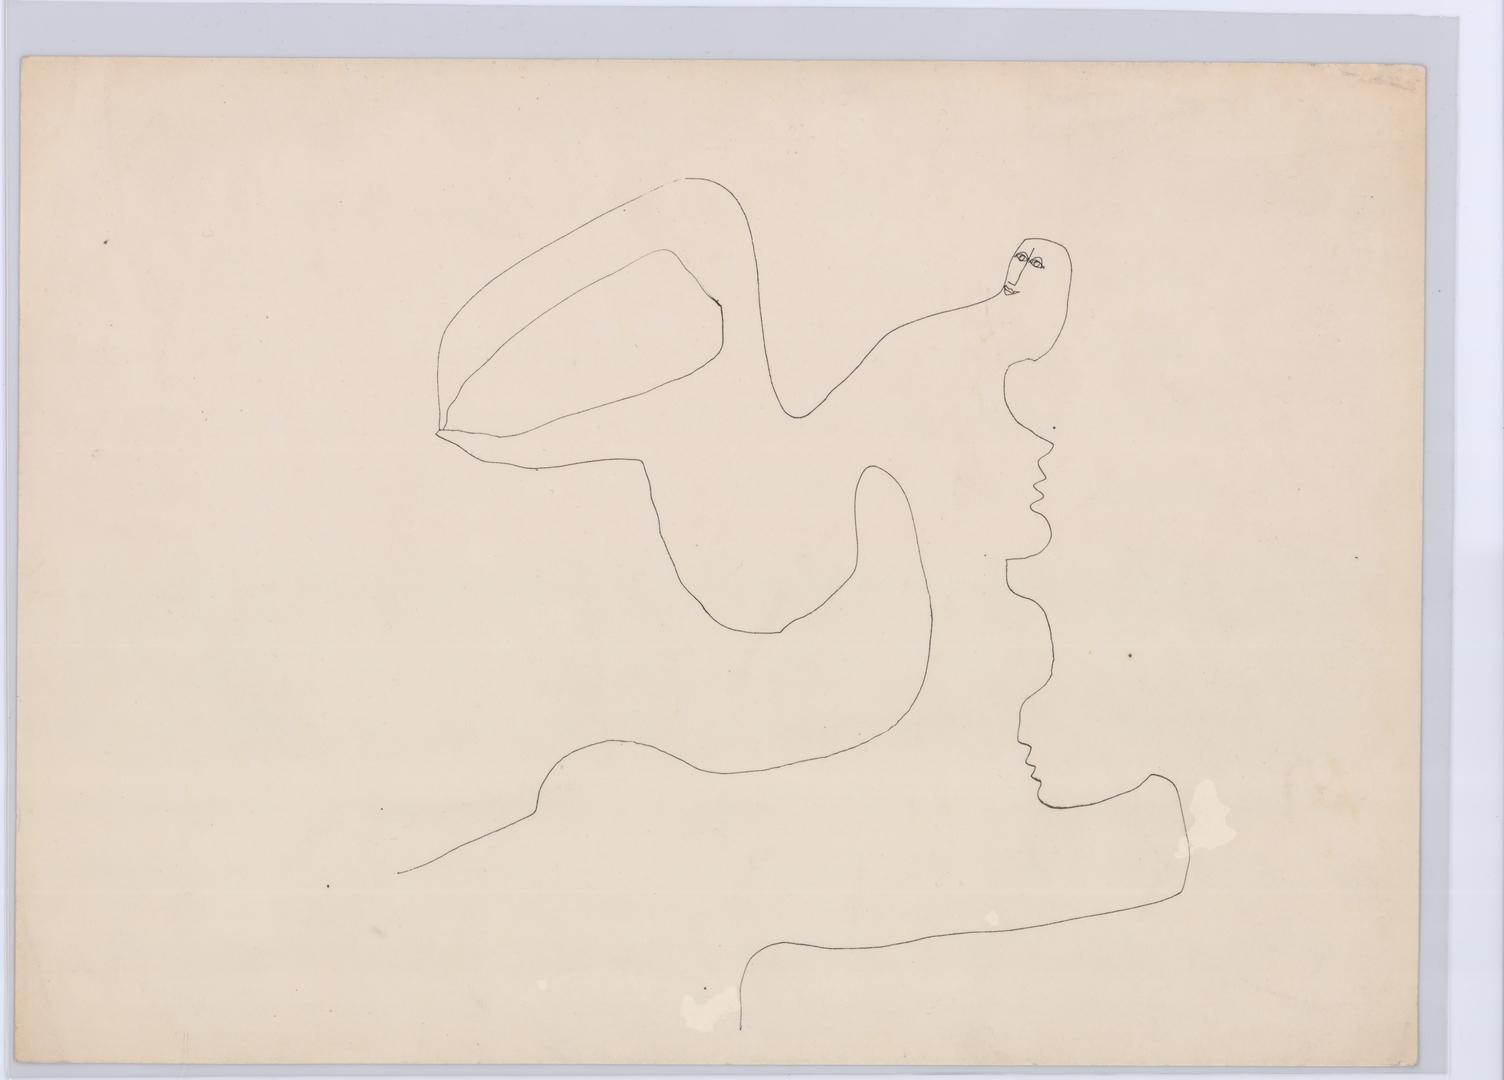 D64.26 Franciszka Themerson Claw-arm, 1964